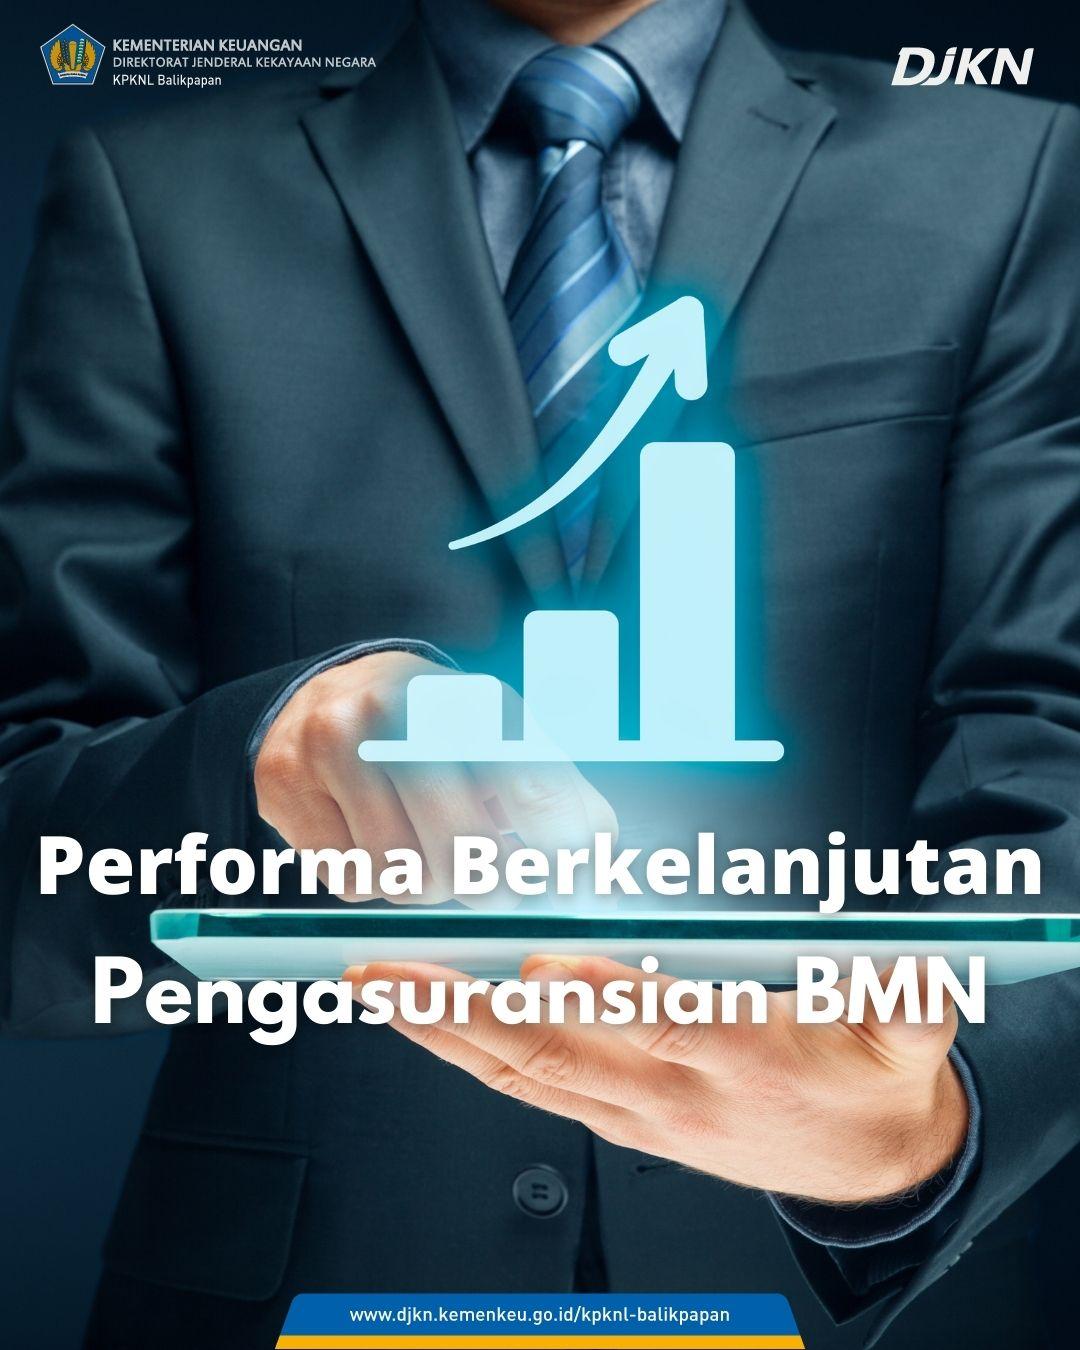 Performa Berkelanjutan Pengasuransian BMN